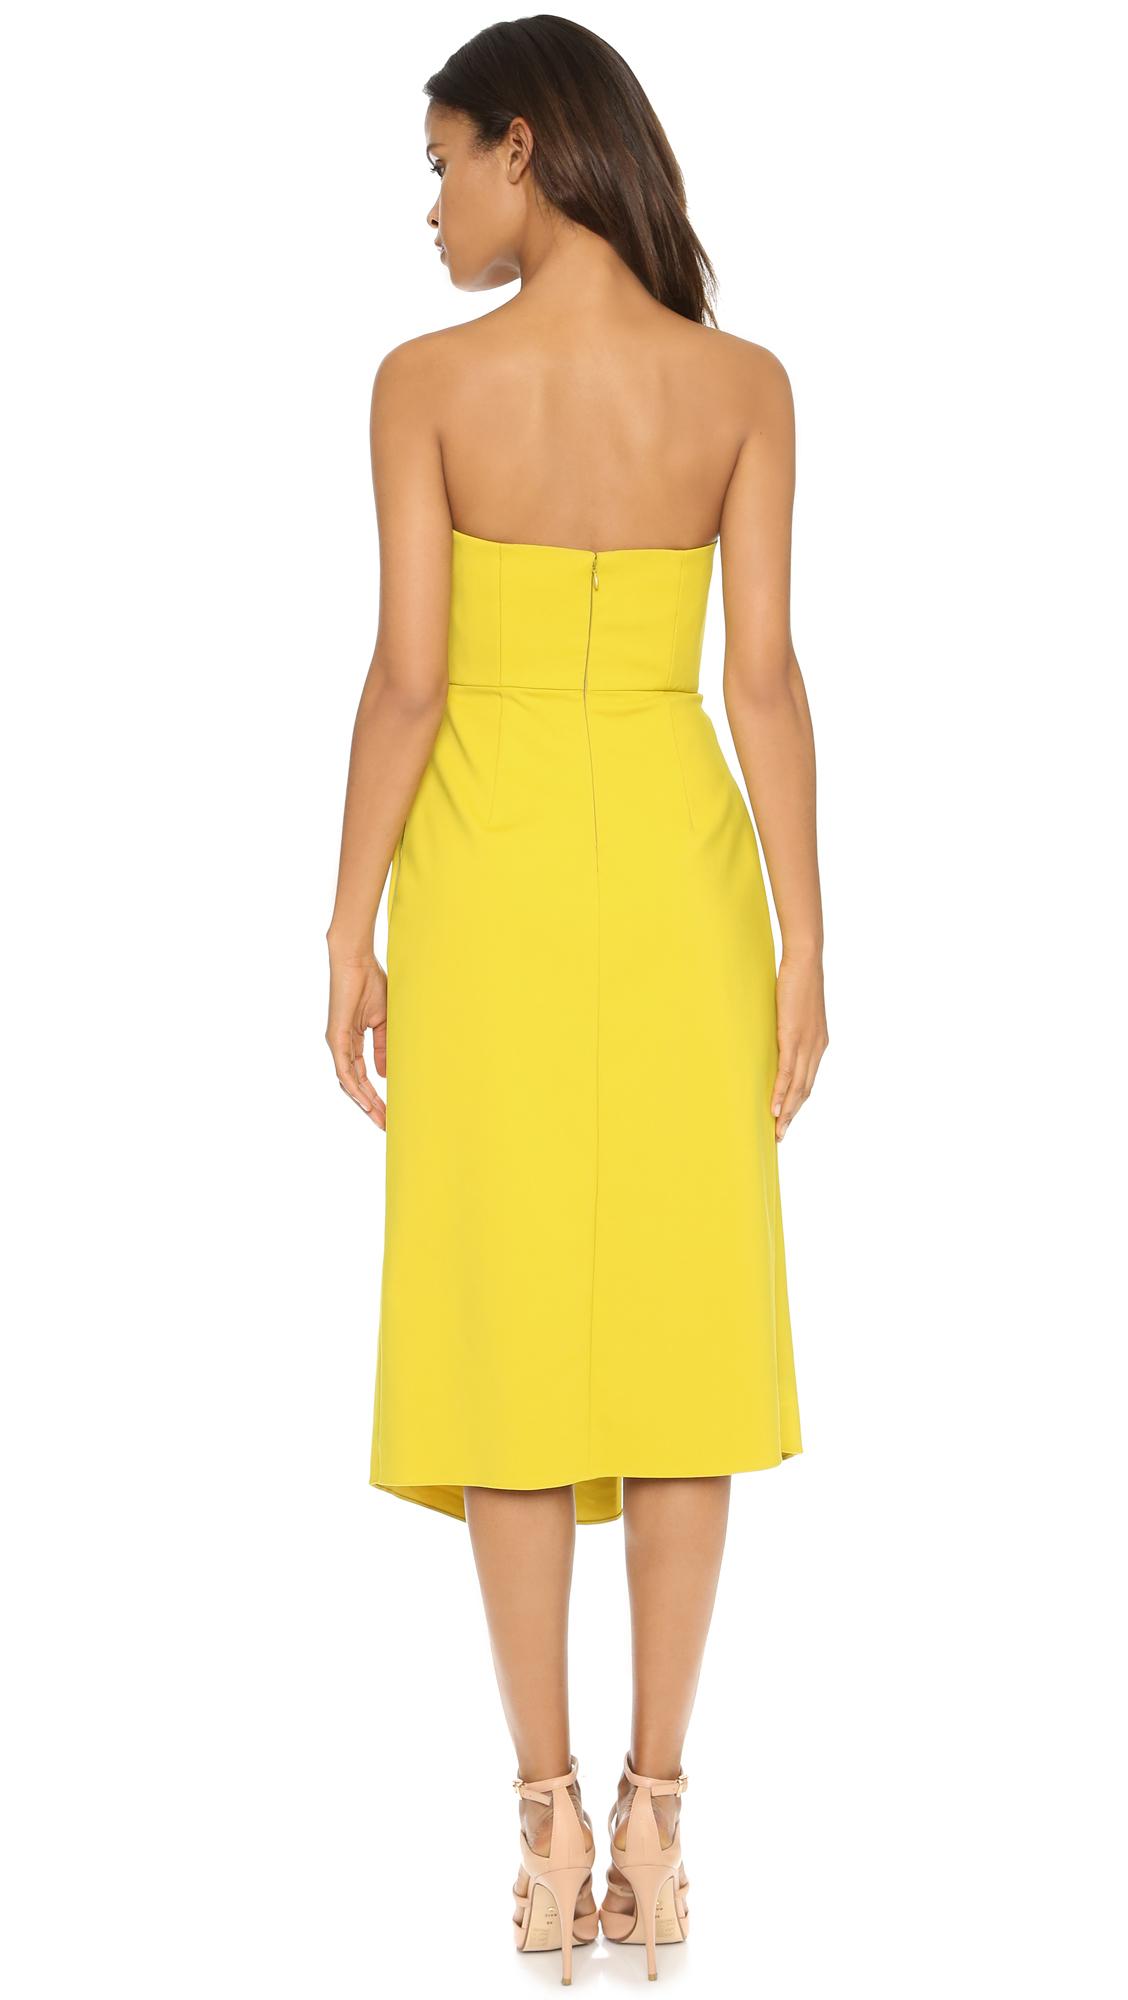 Tibi Asymmetric Drape Strapless Dress - Mustard Seed in Yellow - Lyst